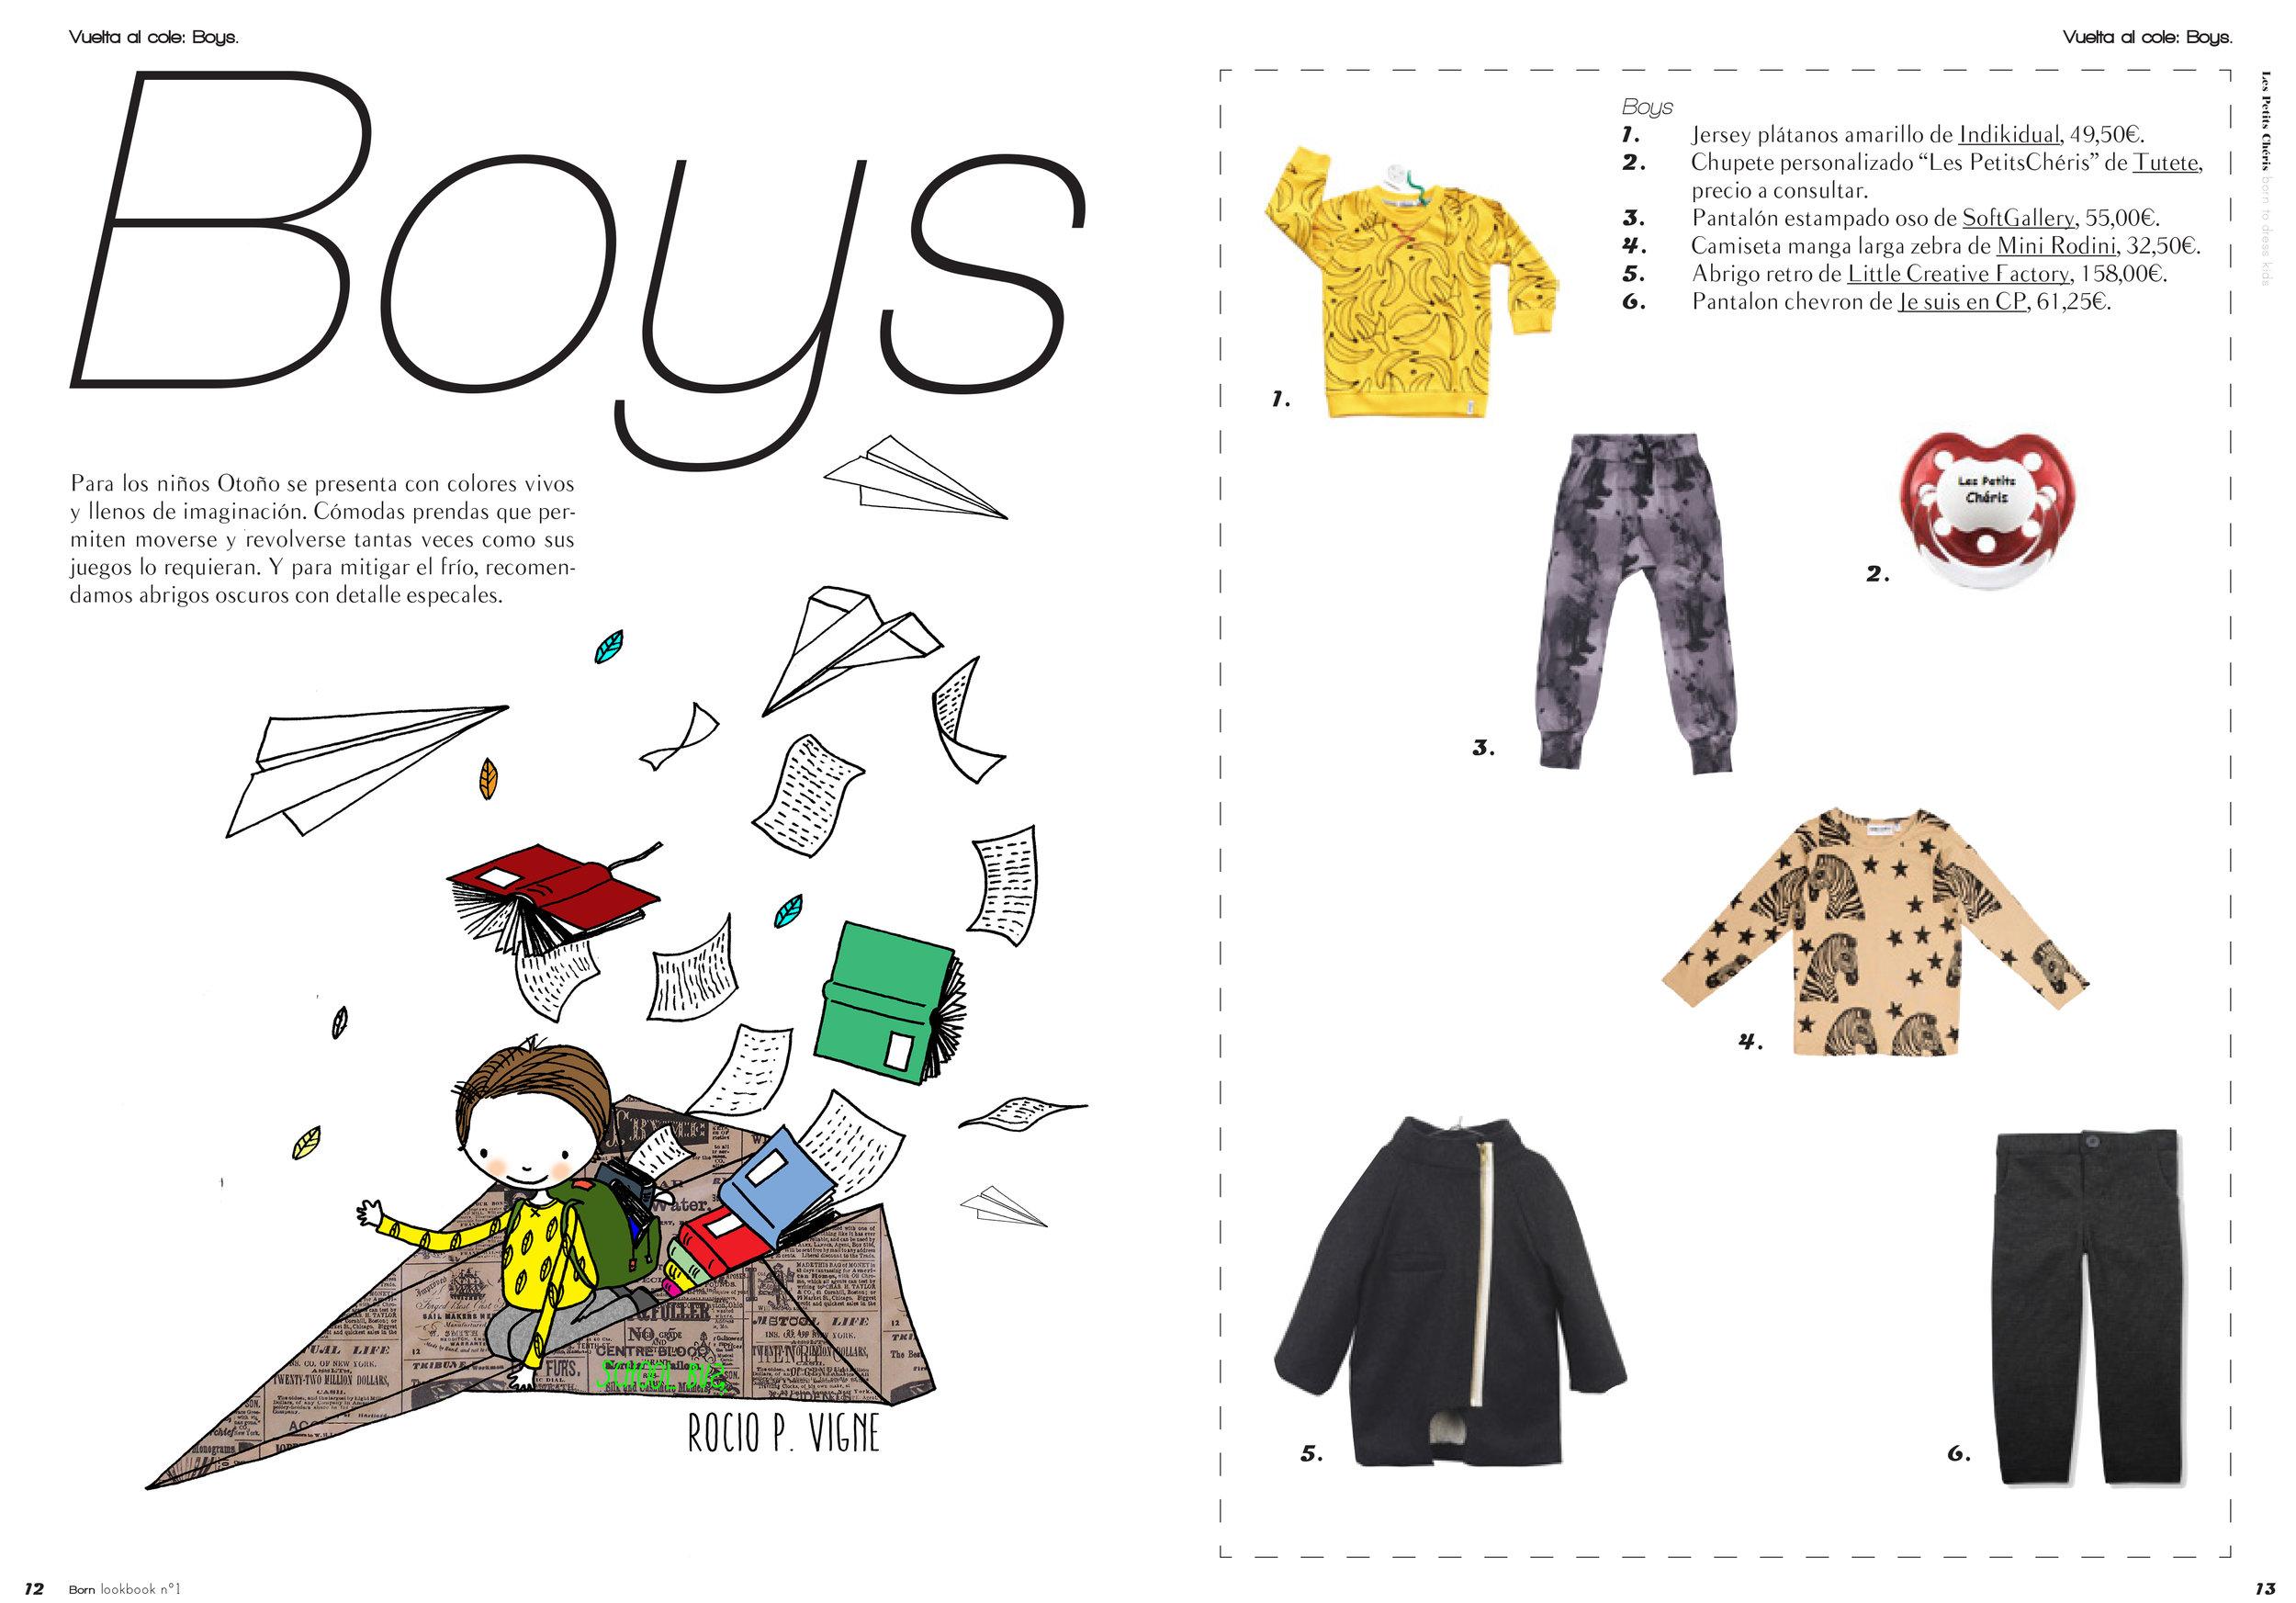 LPC - lookbook - boys_illustrated by rocio.jpg